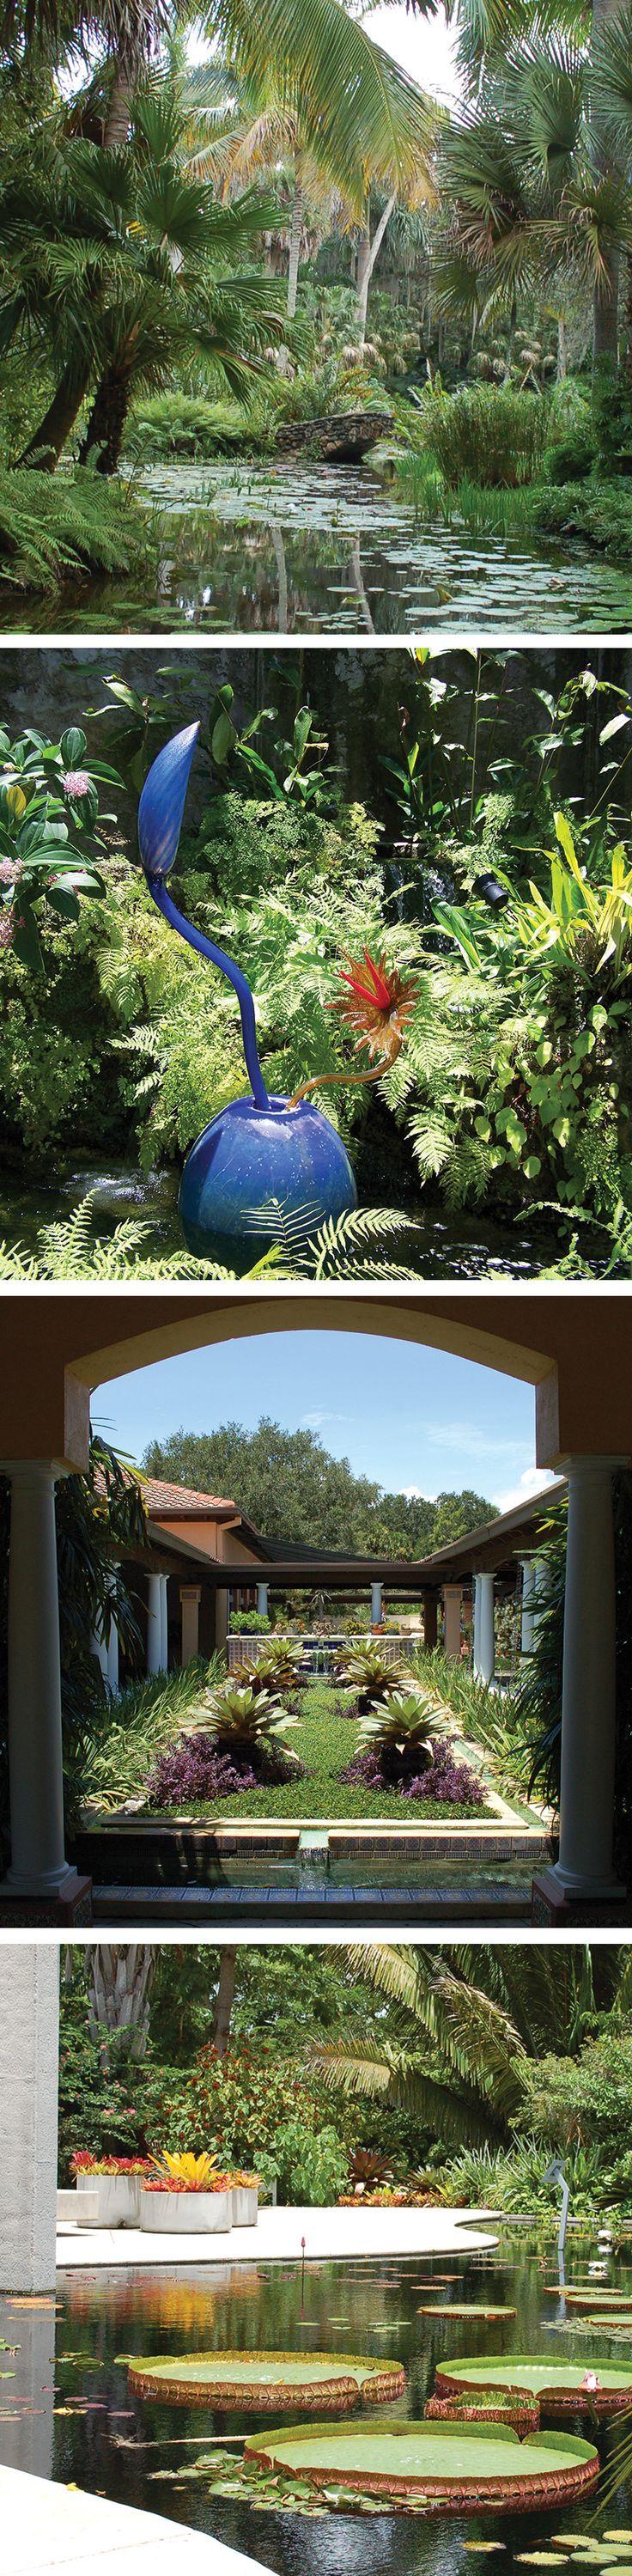 best 25 florida botanical gardens ideas on pinterest sarasota